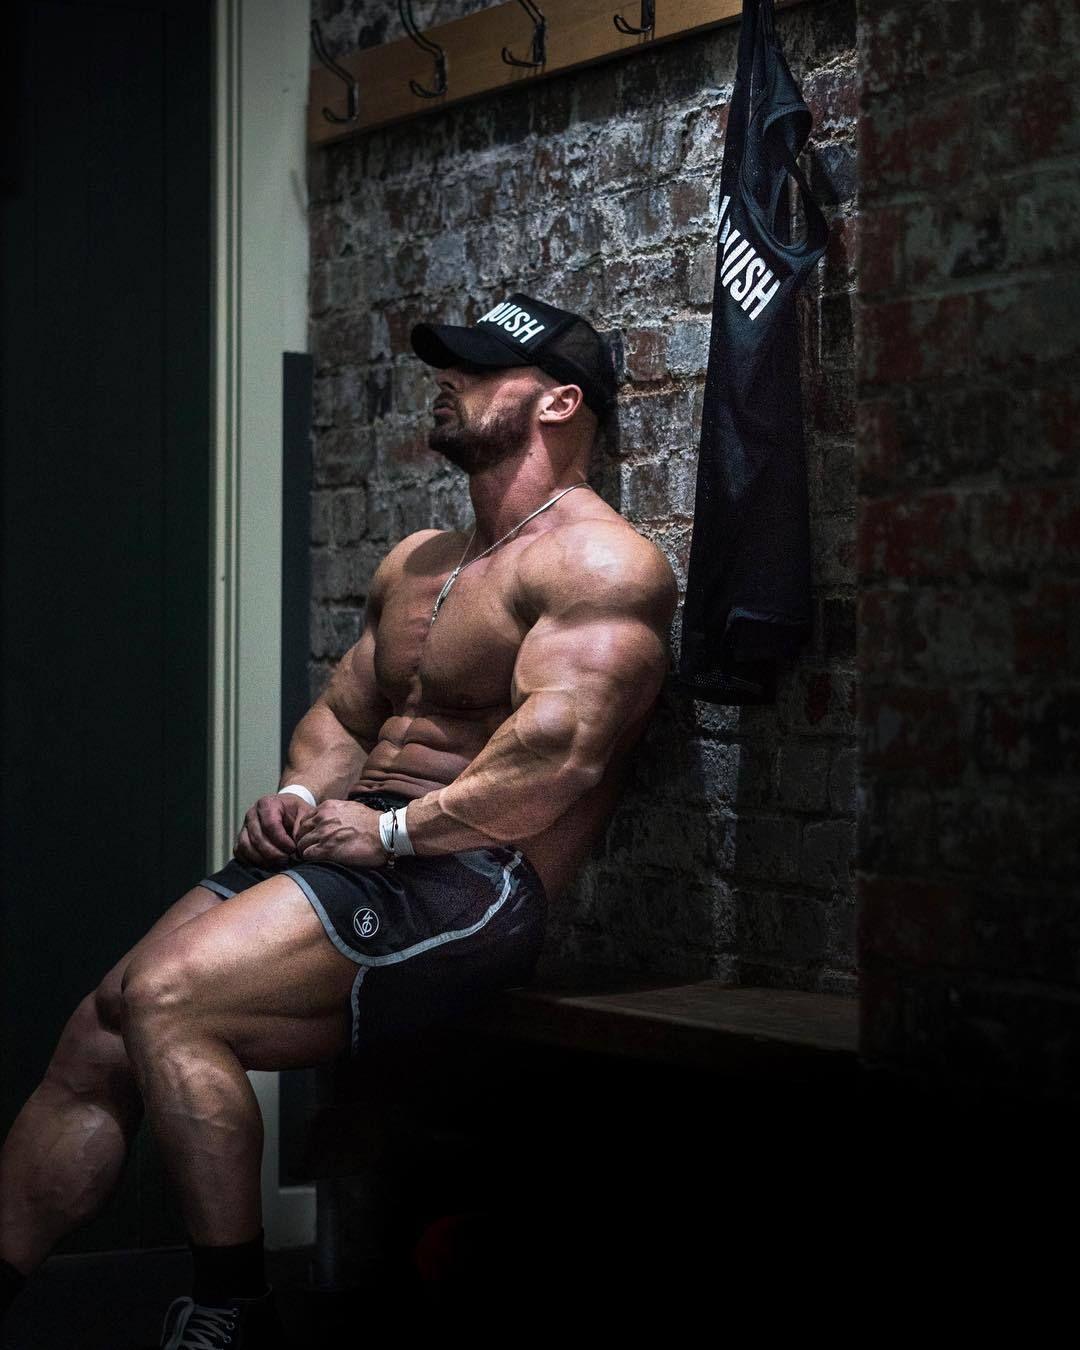 Joey Sergo   Gym motivation quotes. Fitness inspiration quotes. Bodybuilding motivation quotes